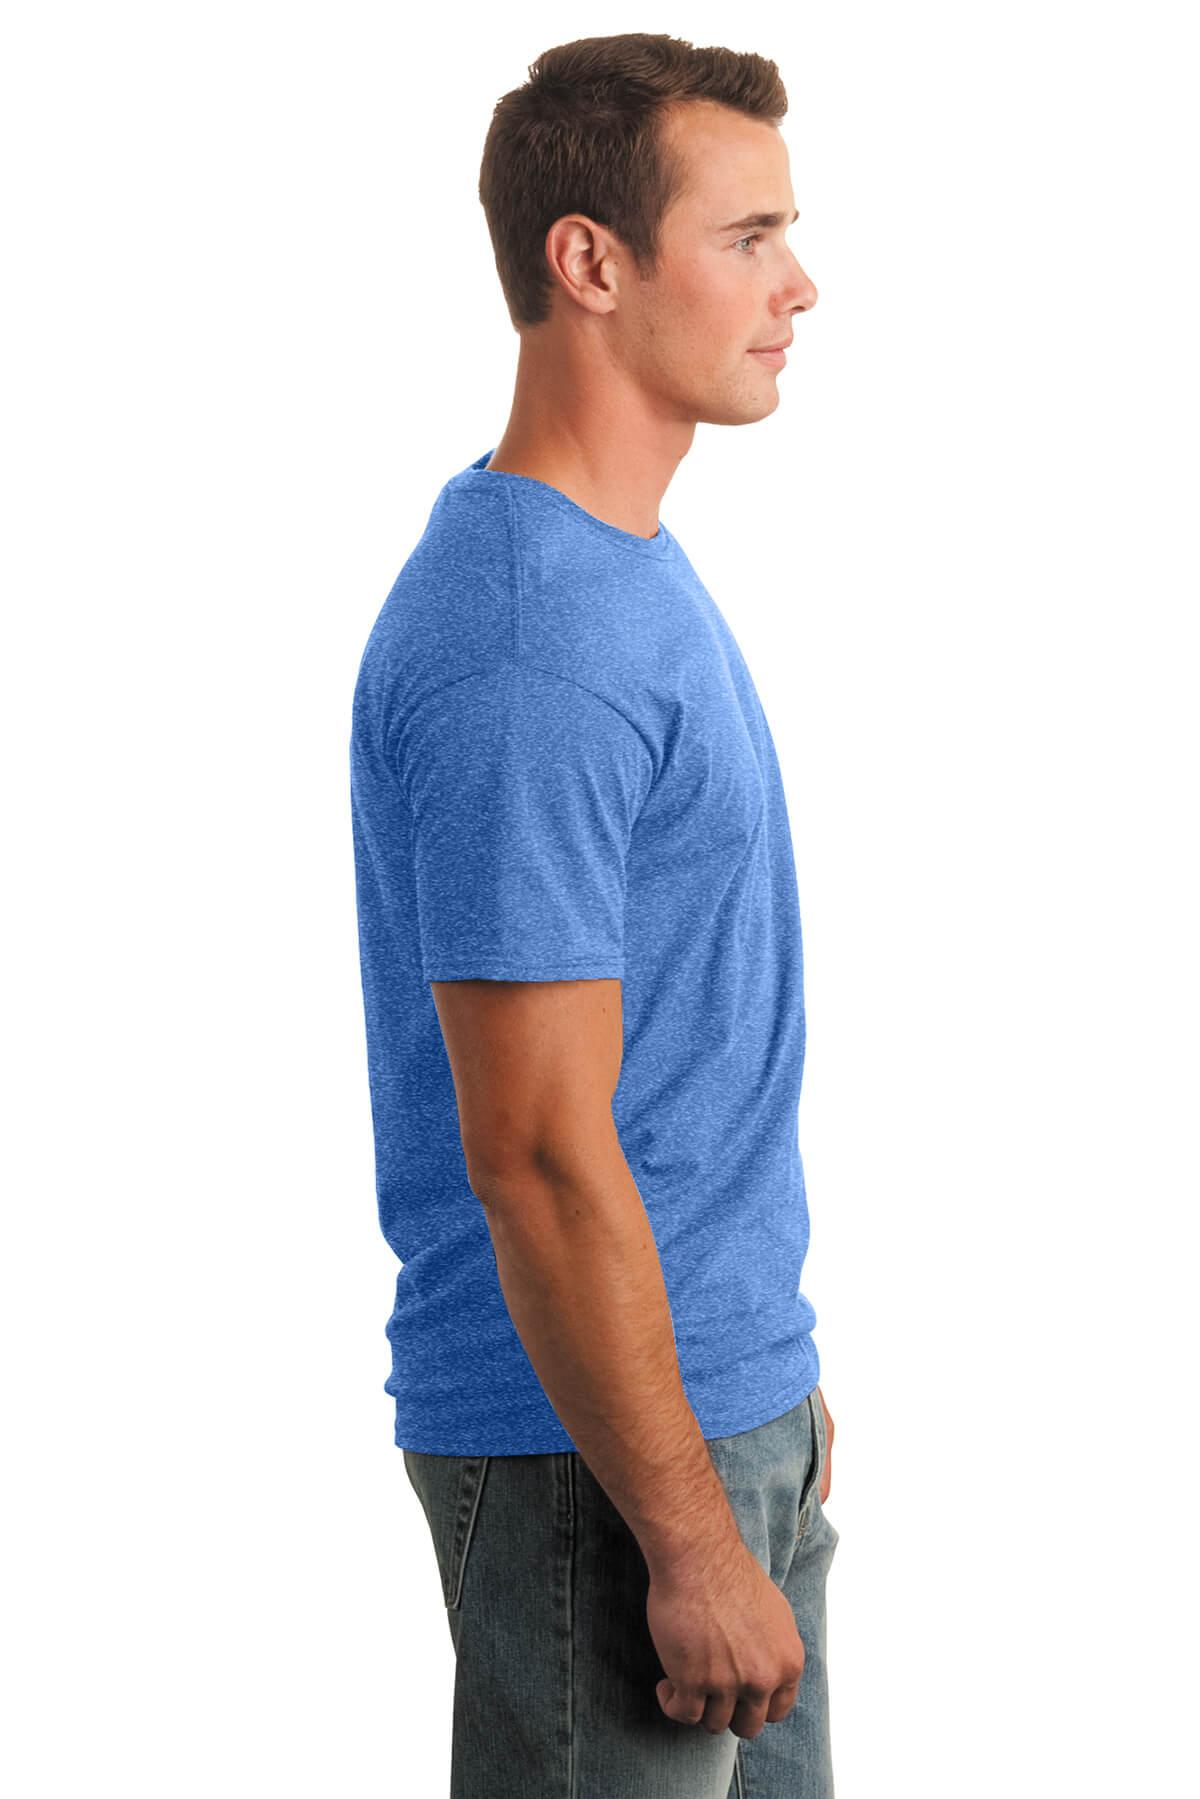 Heather Royal T-Shirt Model Right